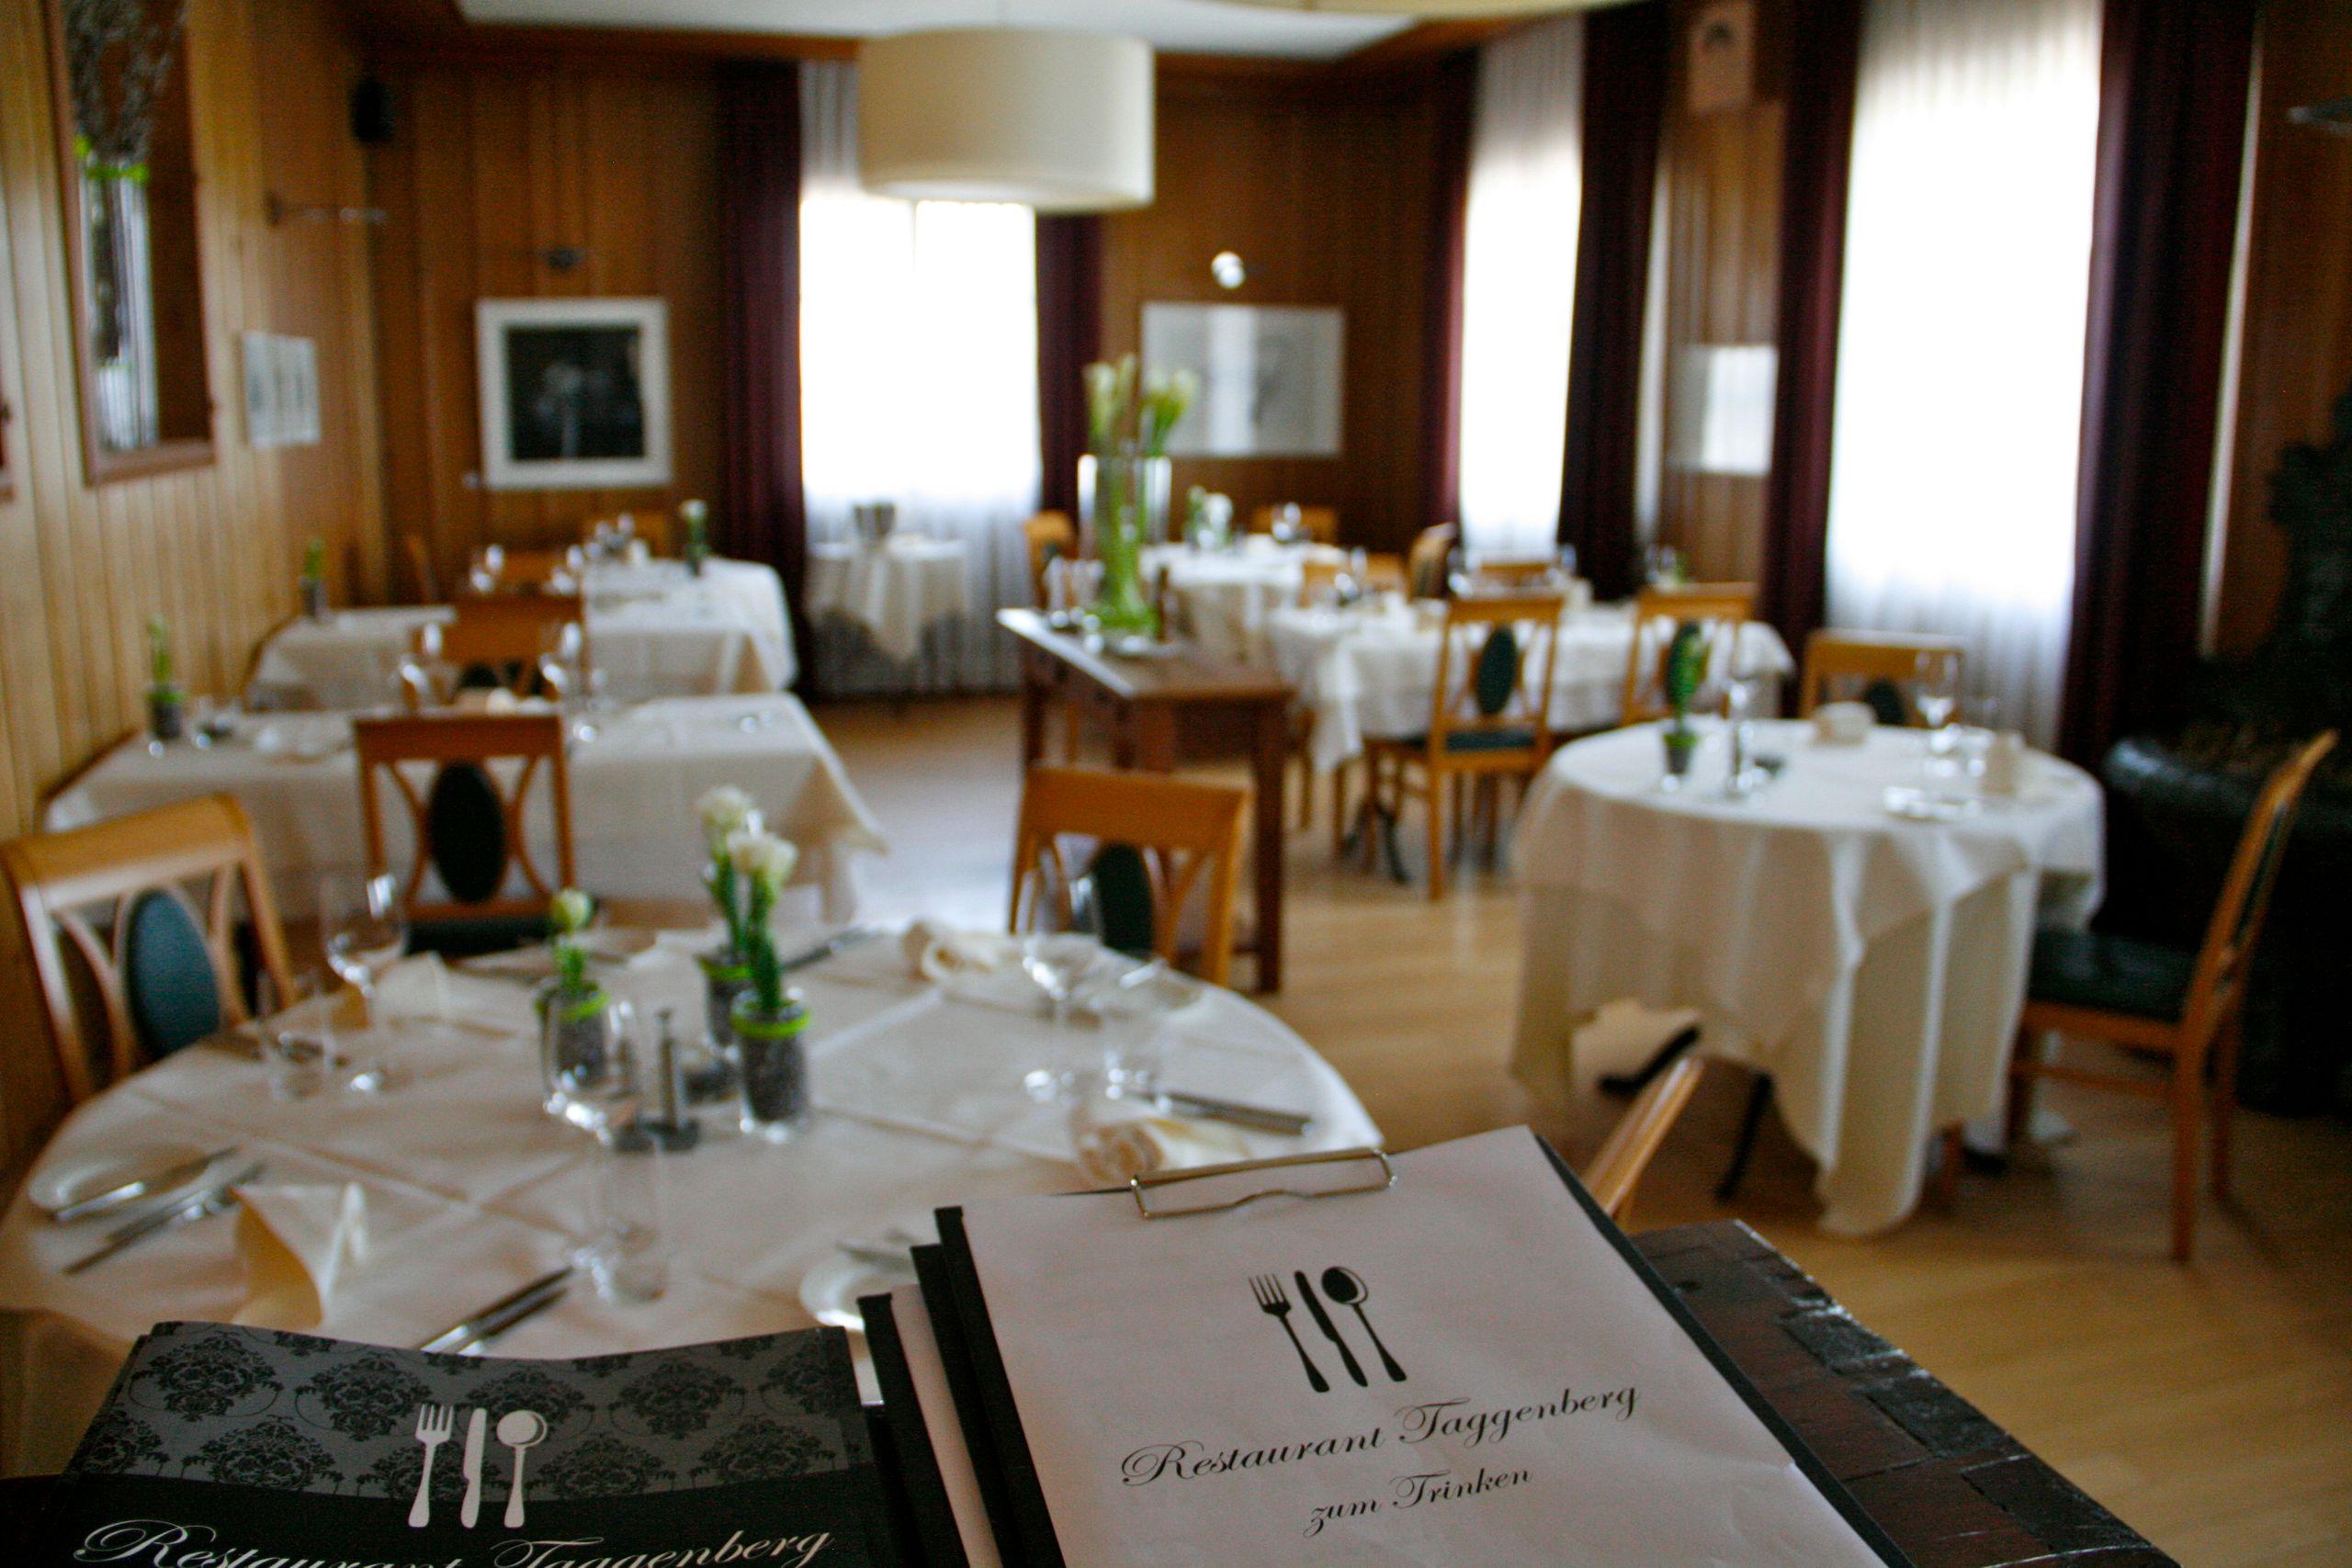 Vitalizacion-vitalizador-GIE-experiencias-restaurante-taggenberg